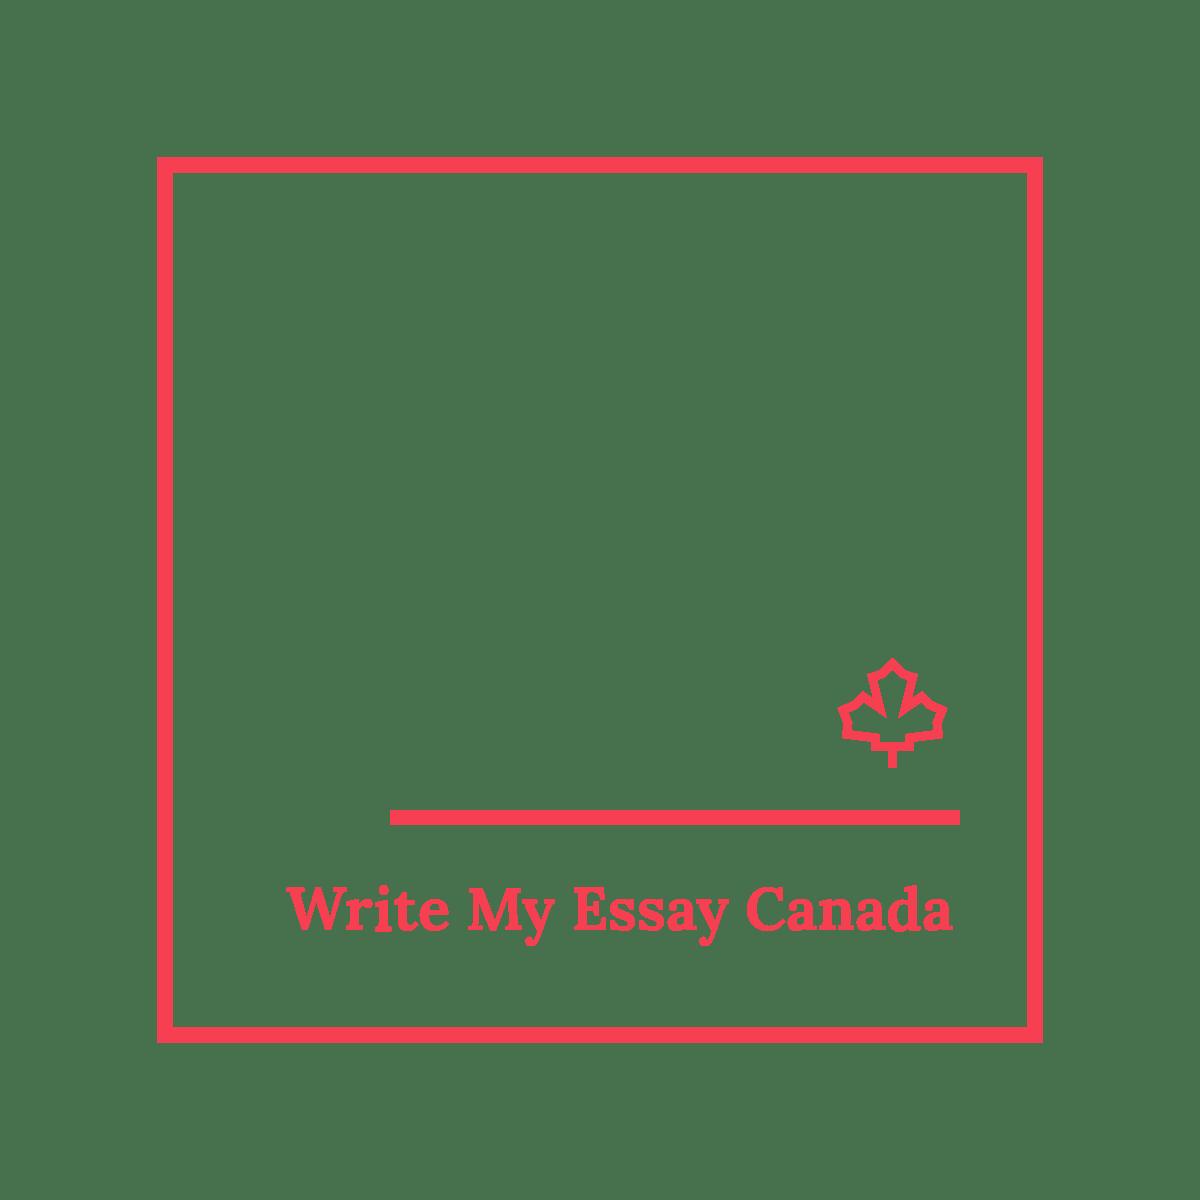 WriteMyEssayCanada logo